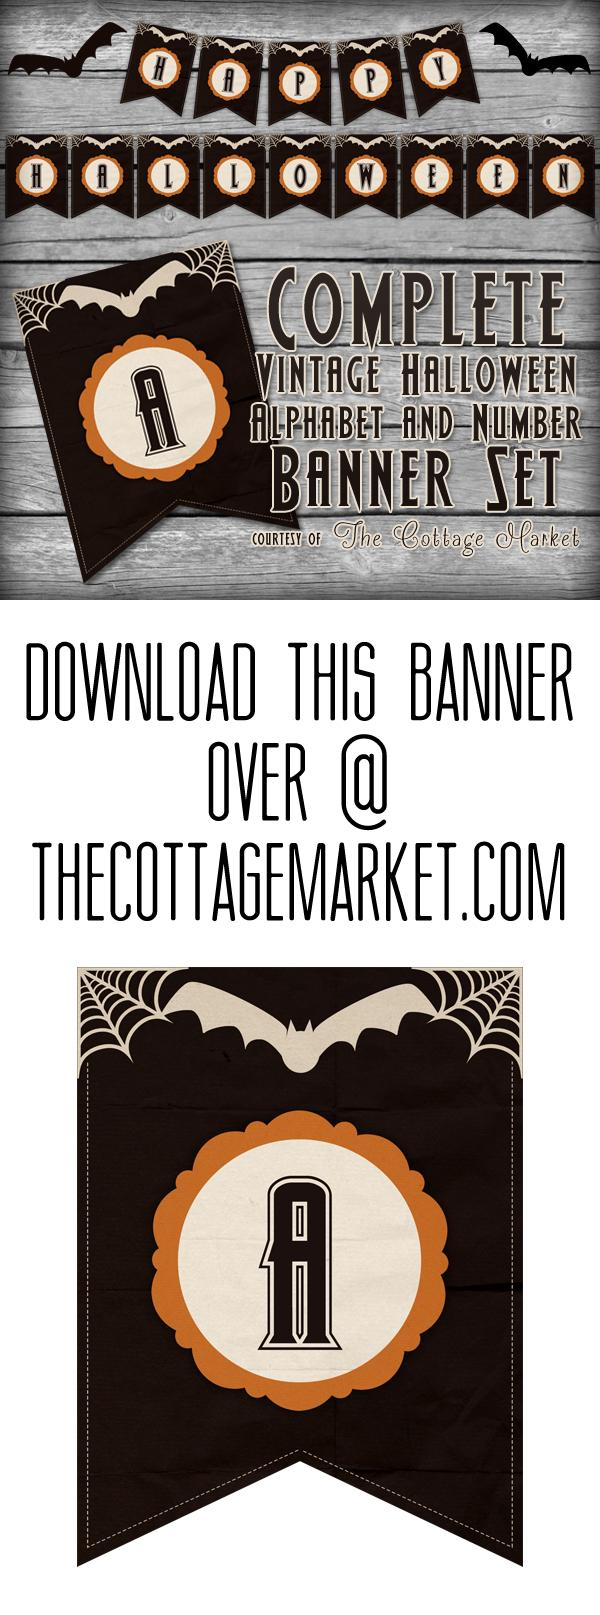 Free Printable Halloween Banner Set   The Cottage Market - Free Printable Halloween Banner